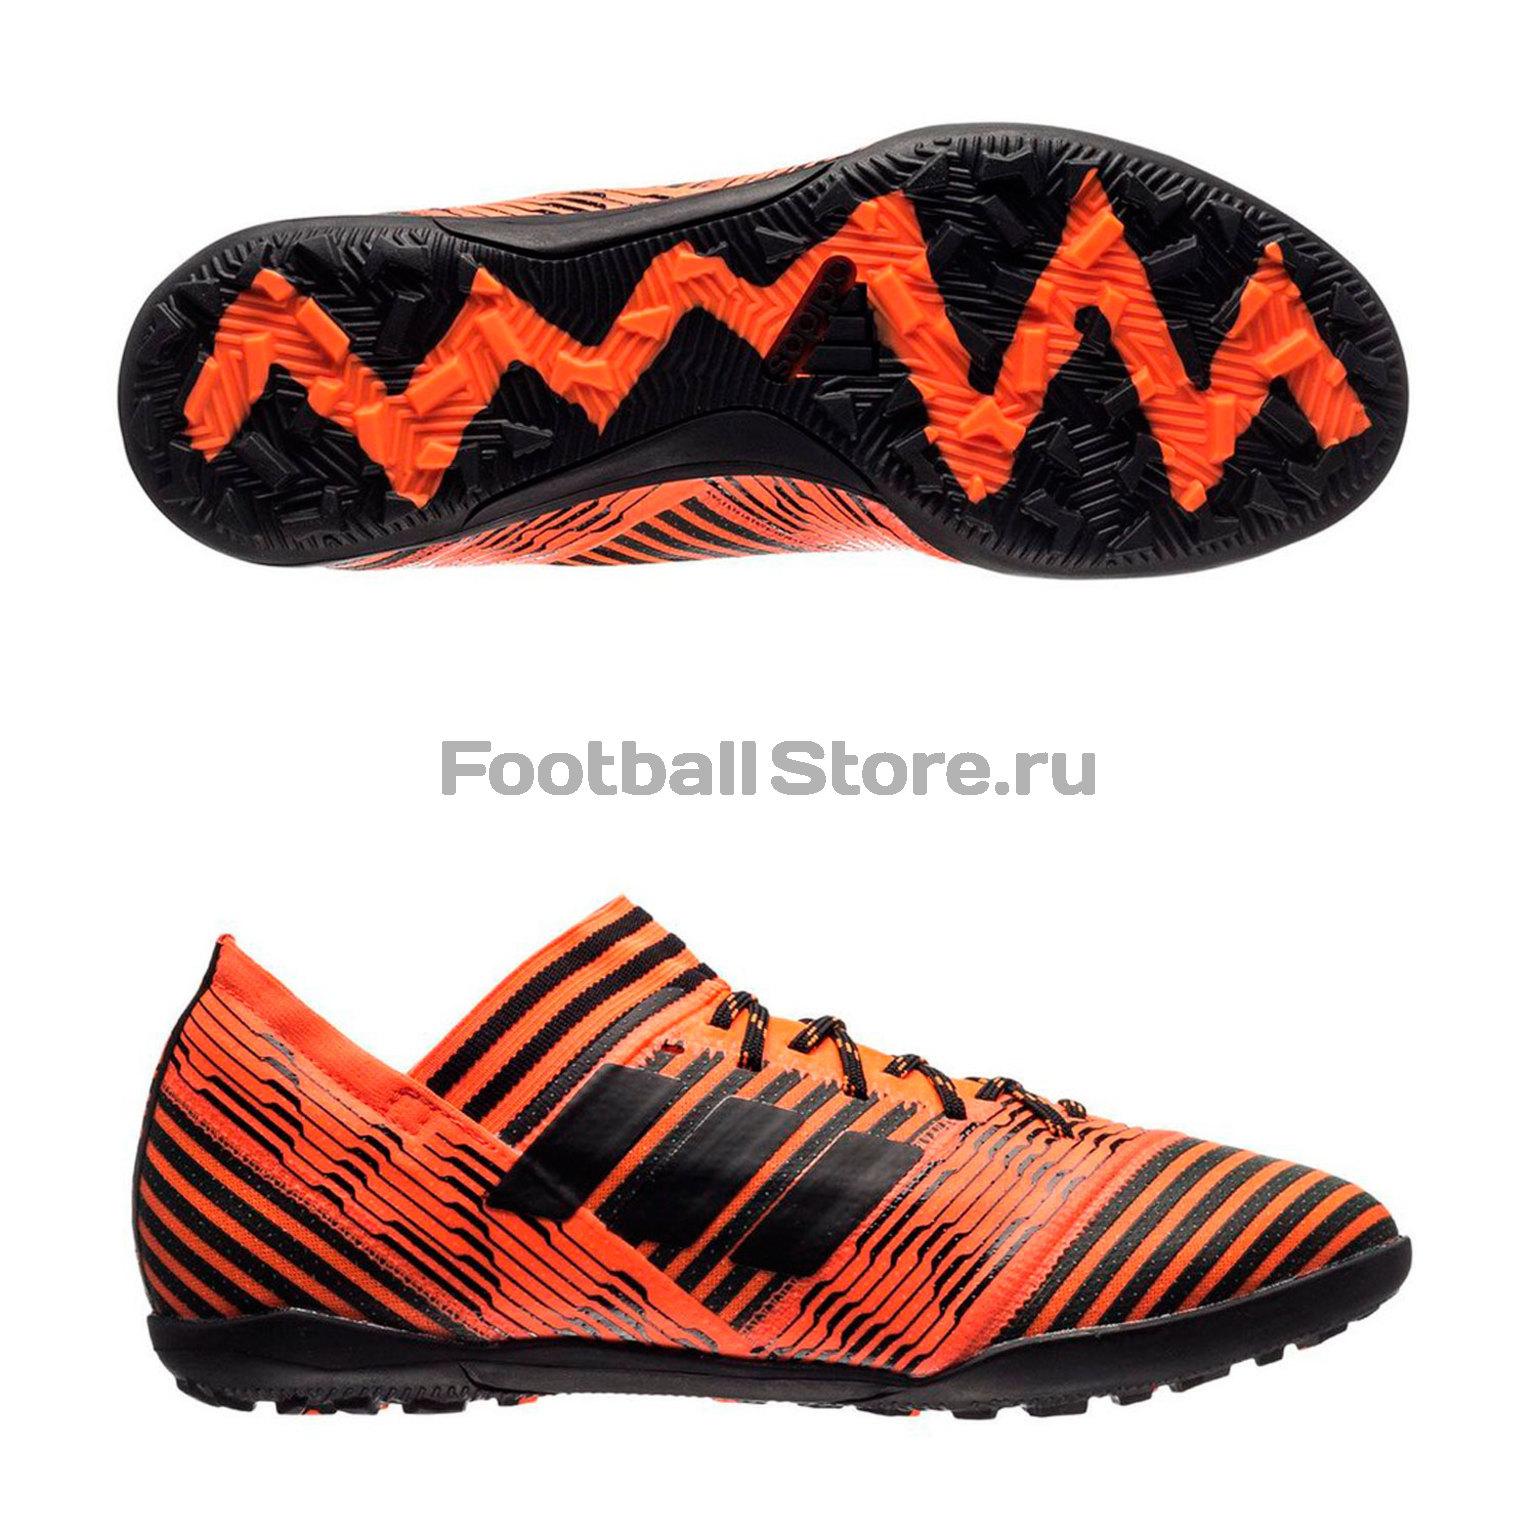 Шиповки Adidas Nemeziz Tango 17.3 TF JR BY2829 обувь для зала adidas nemeziz tango 17 3 in jr cp9182